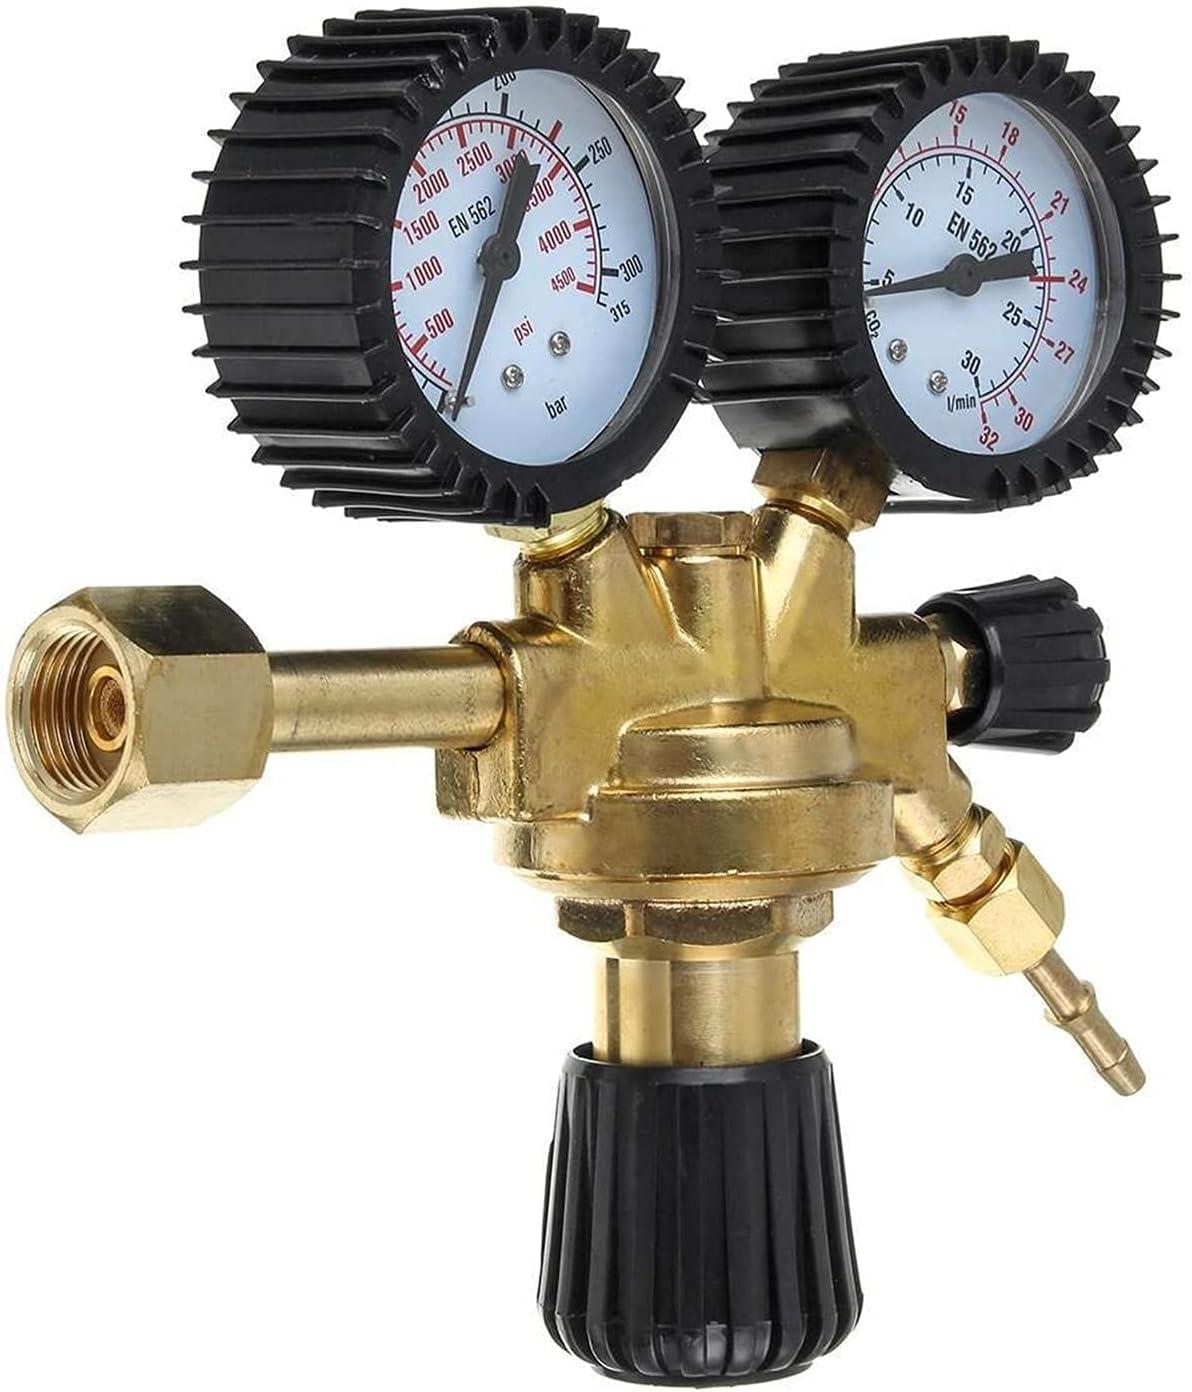 ZHU-CL Air supreme Quantity limited Regulator AR CO-2 Tig Meter,Gas Flow Regula Mig